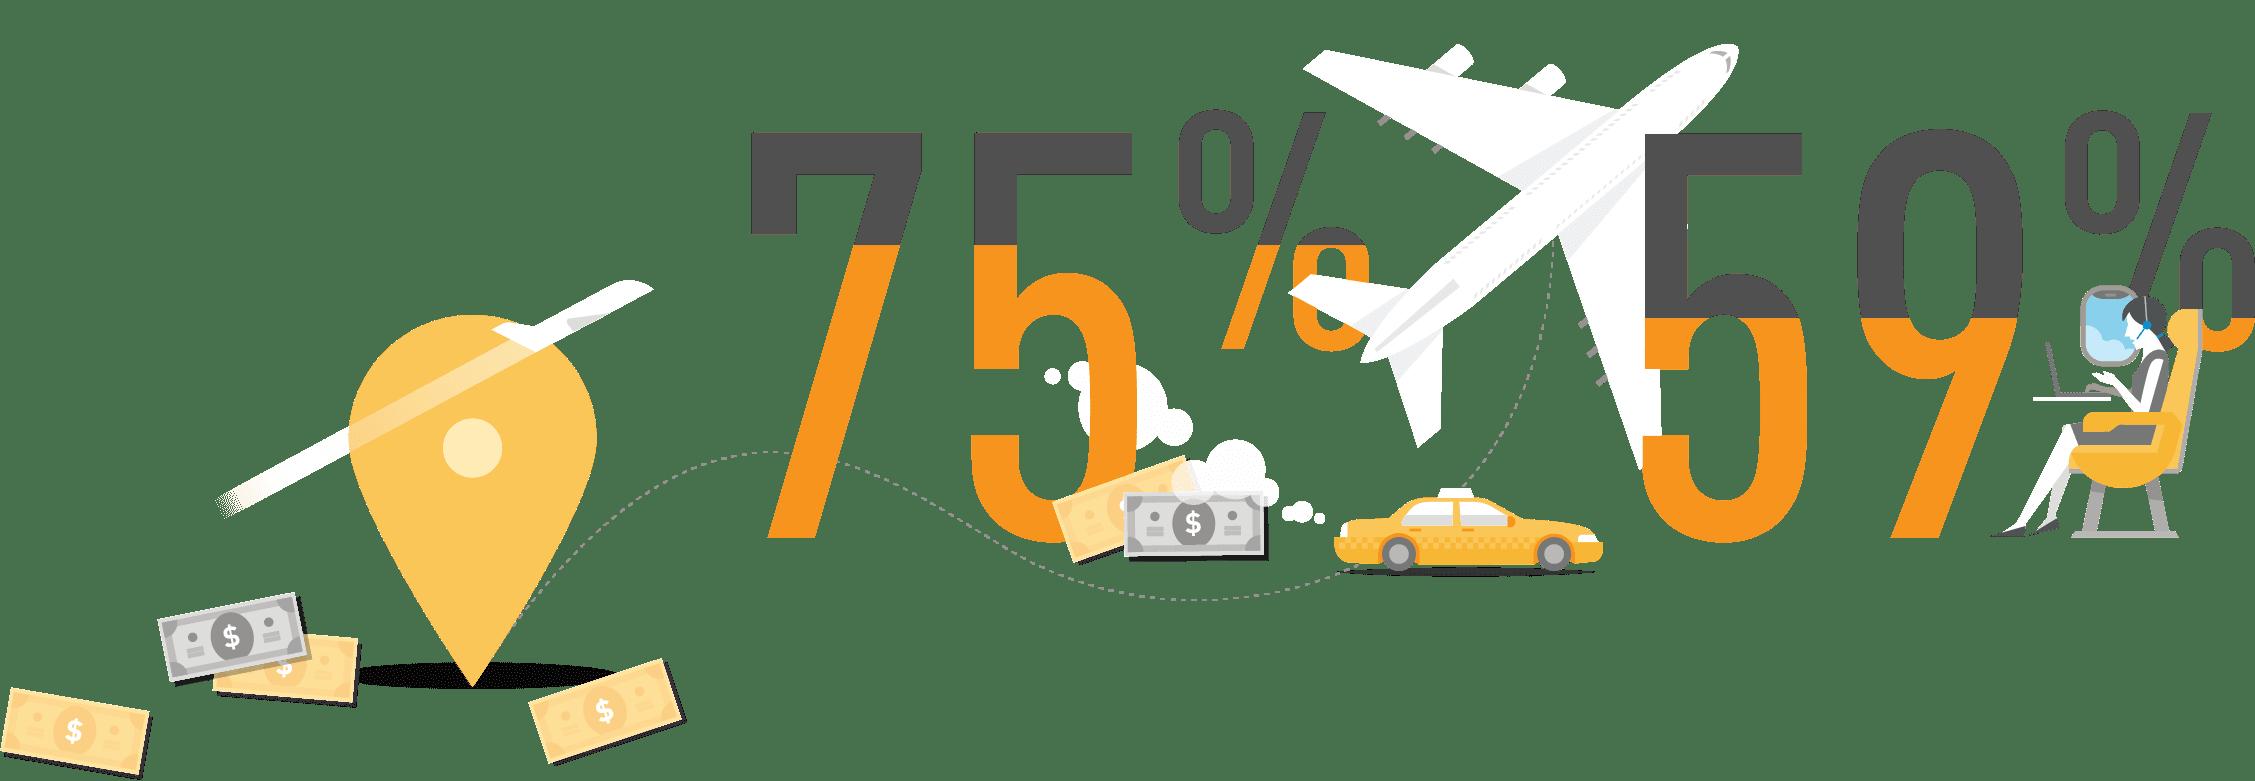 75% 59%